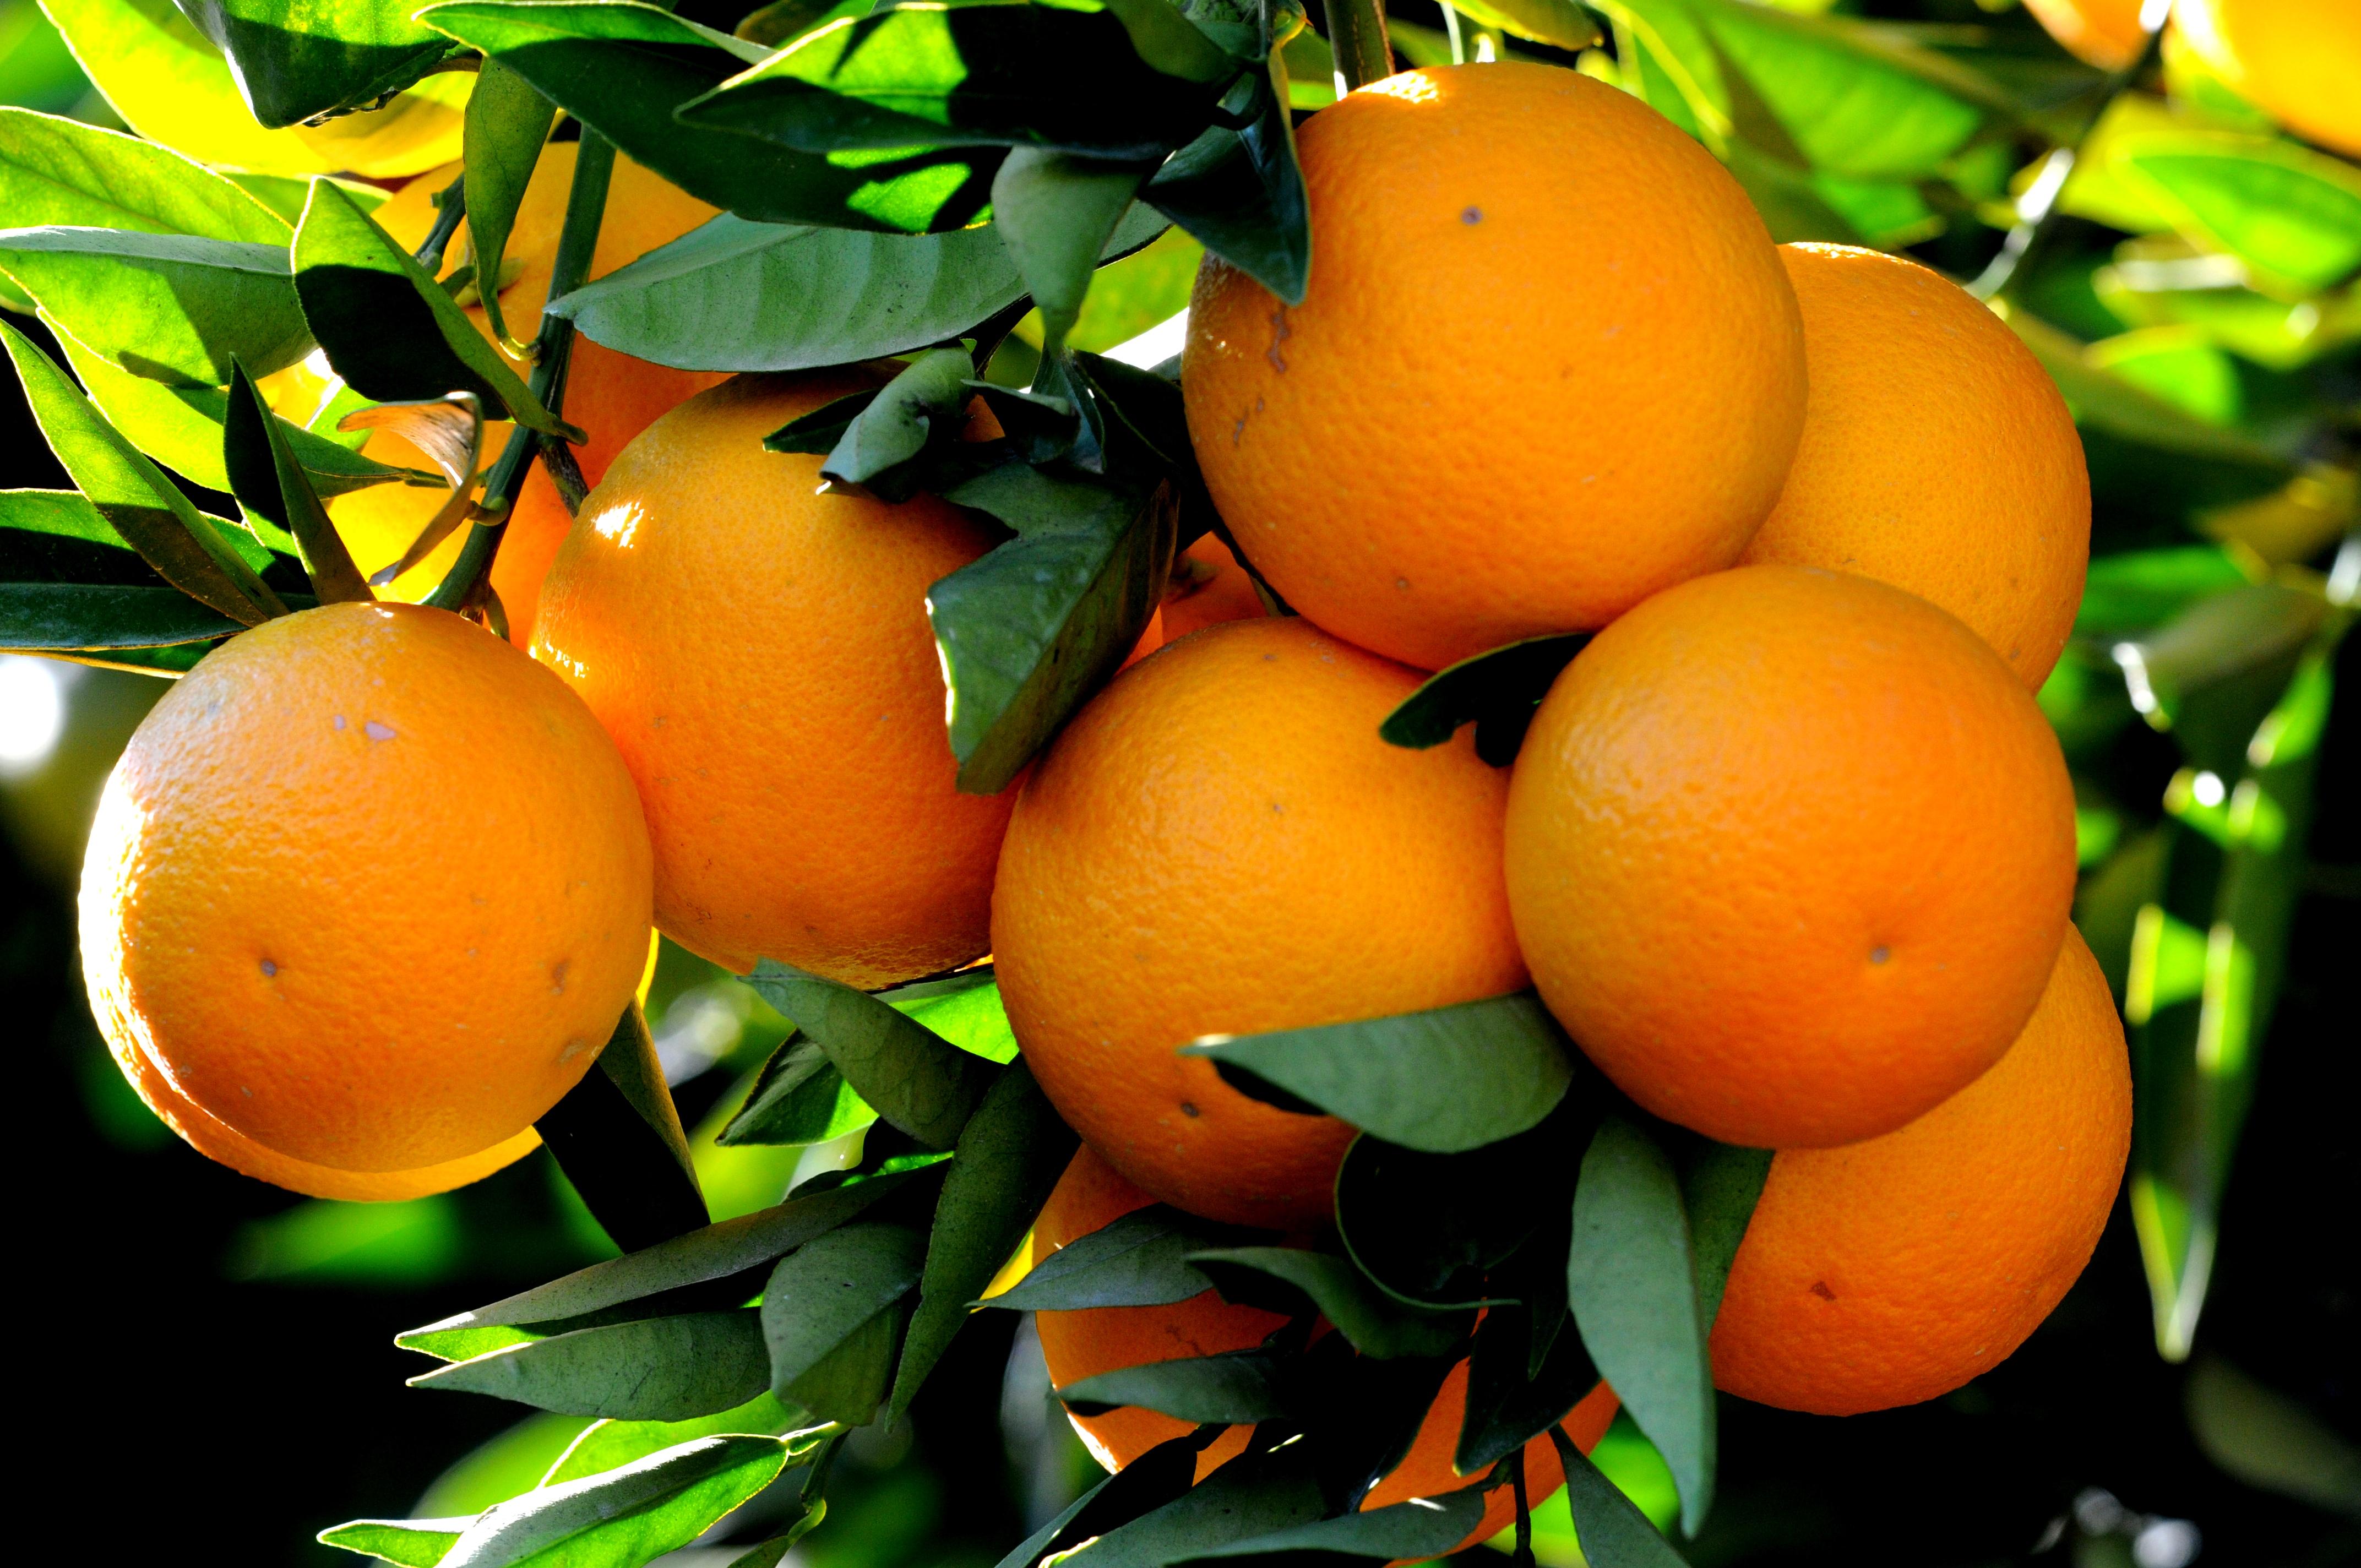 file local orange variety of kozan kozan yerli portakal wikimedia commons. Black Bedroom Furniture Sets. Home Design Ideas